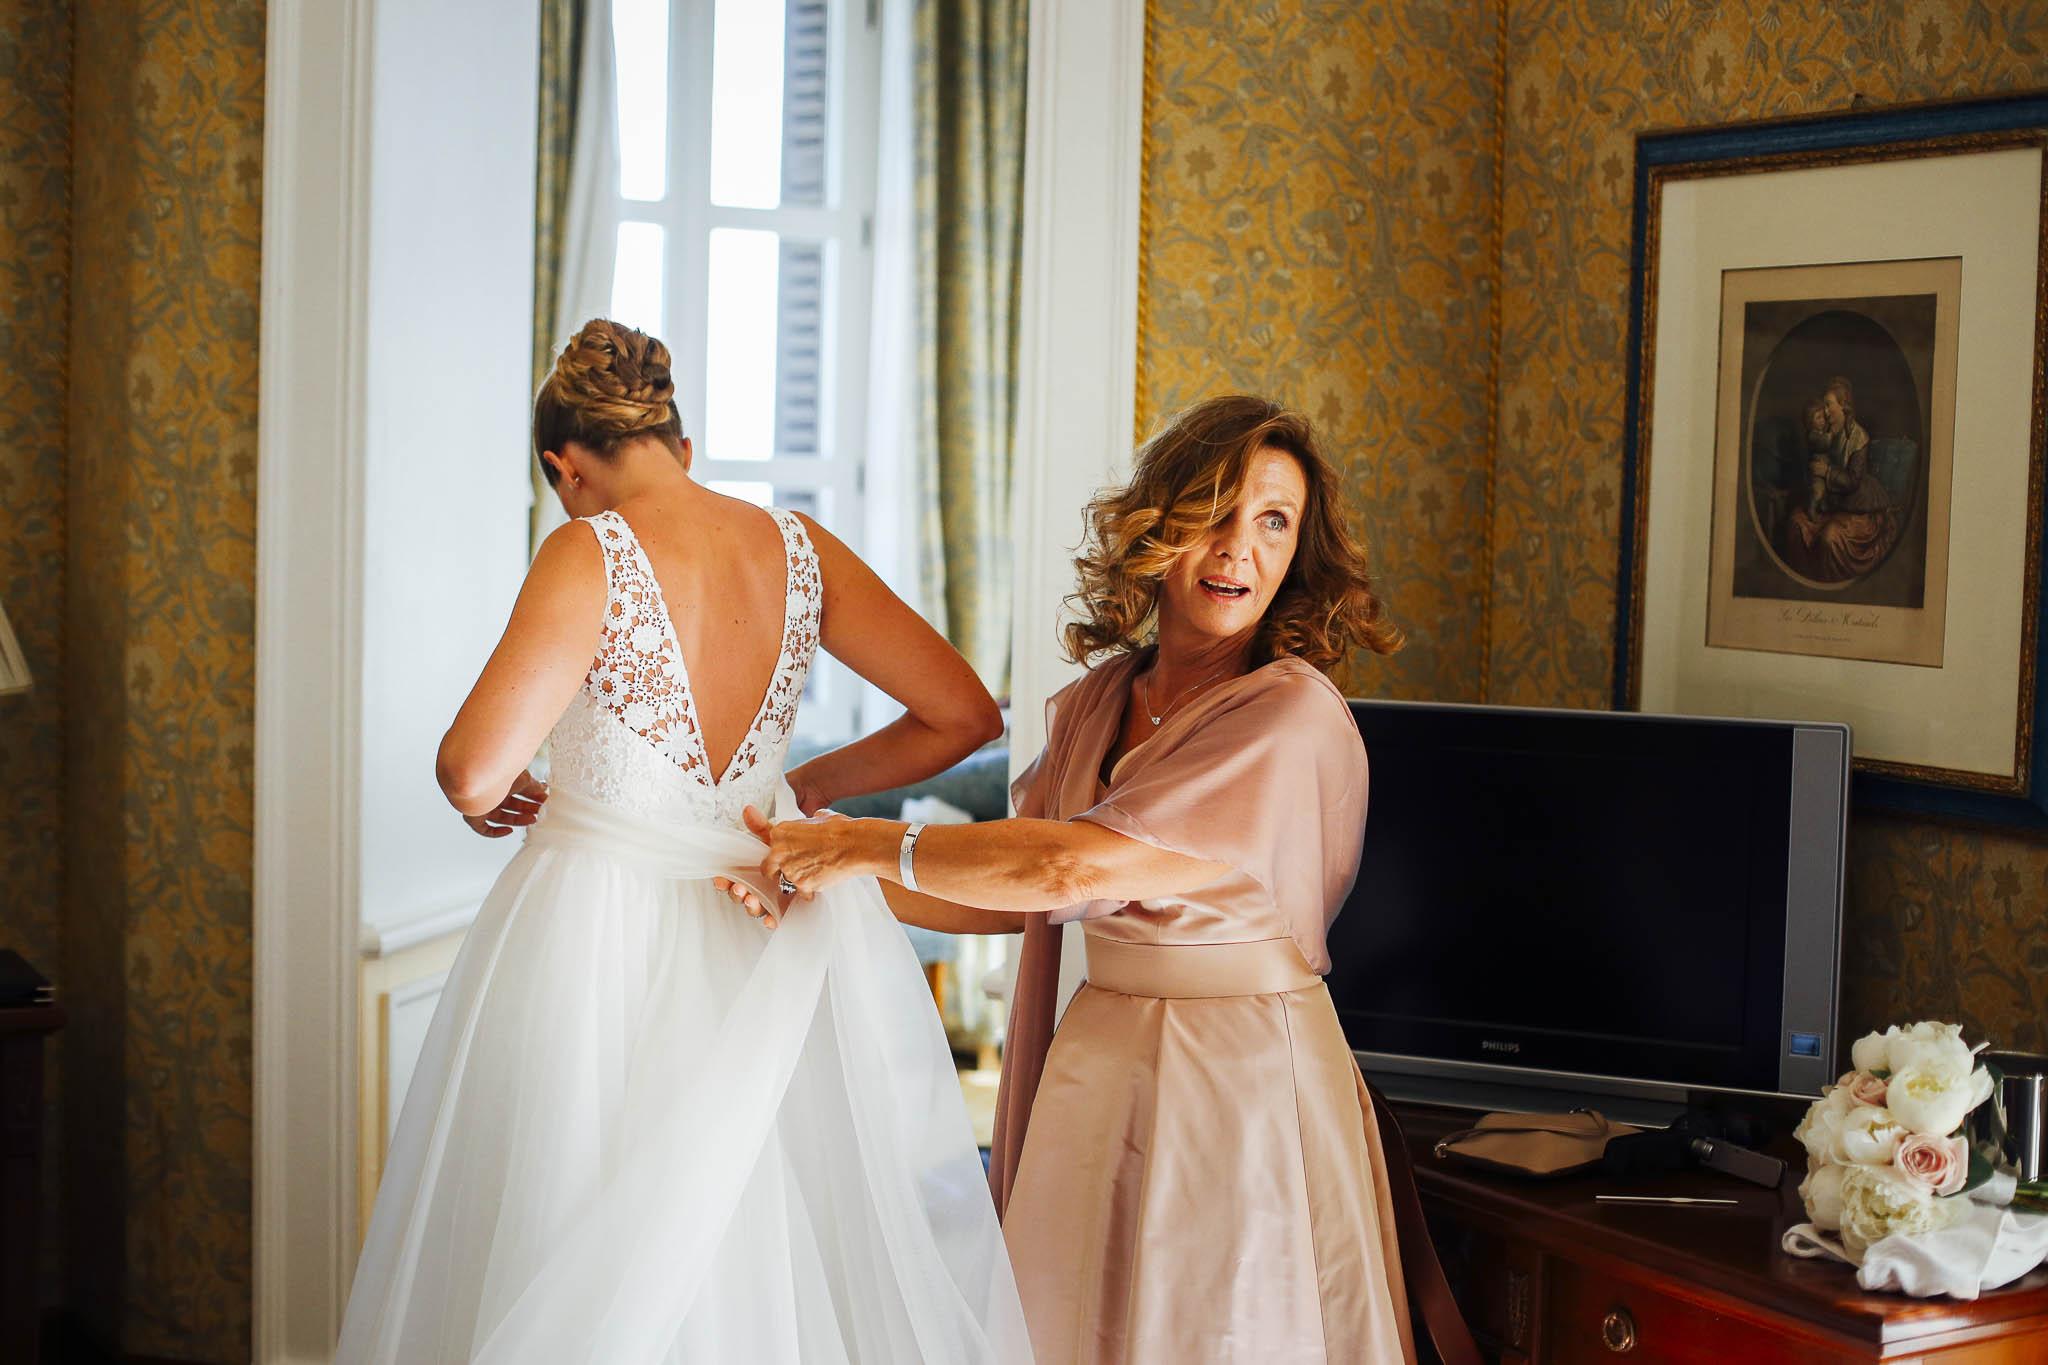 Sofia Gangi Wedding Planner Palermo Matrimonio Villa Igea preparativi Marco Lavinia (5)-min